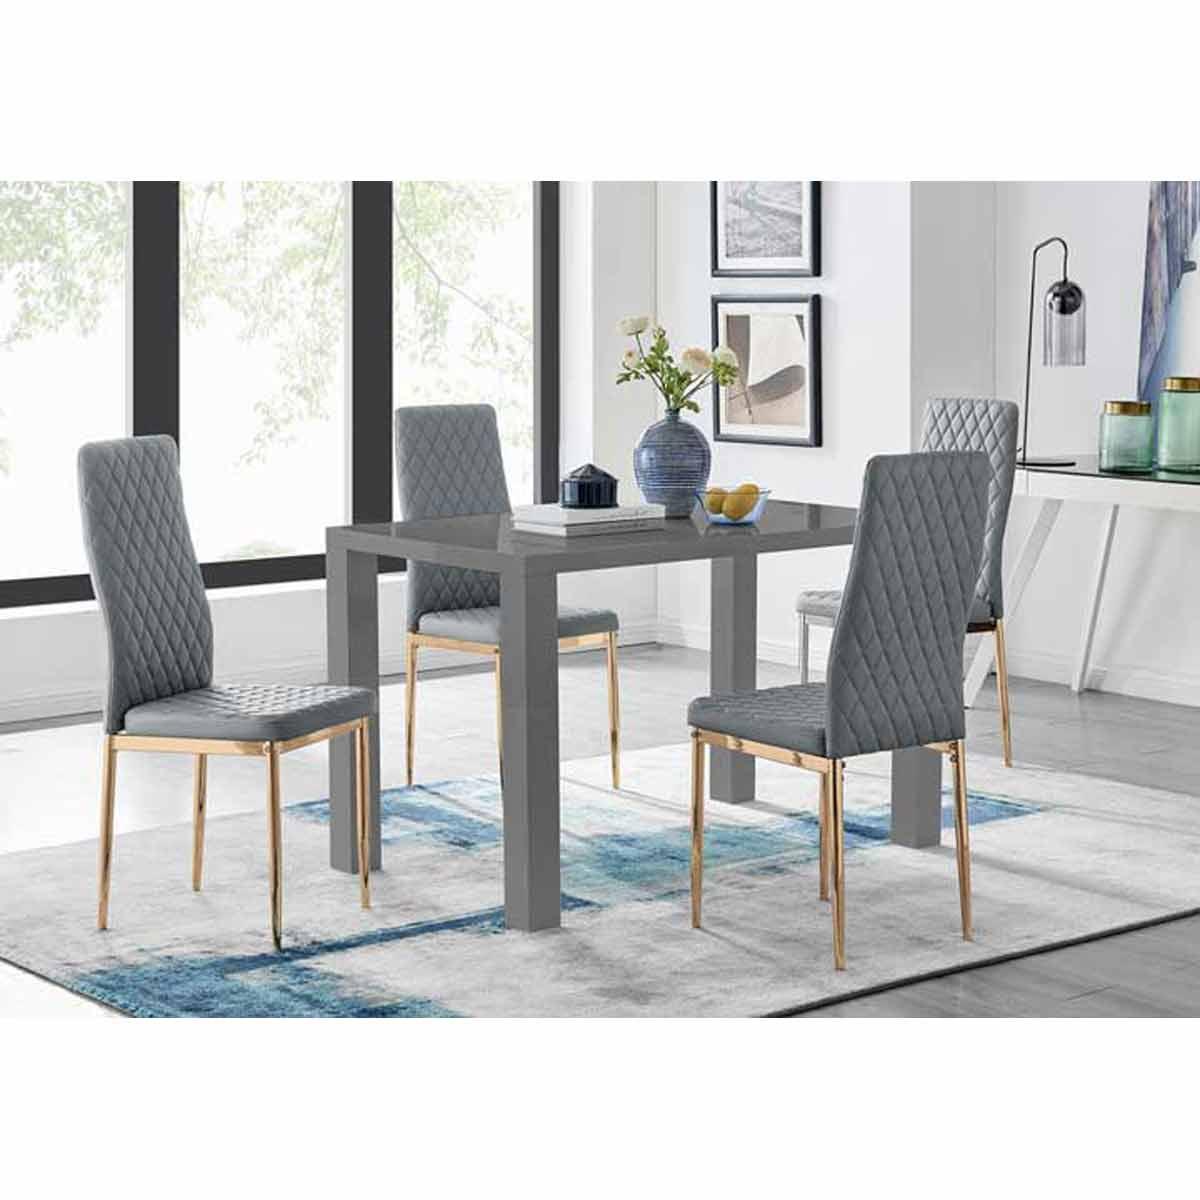 Furniture Box Pivero 4 Grey Dining Table and 4 Grey Gold Leg Milan Chairs